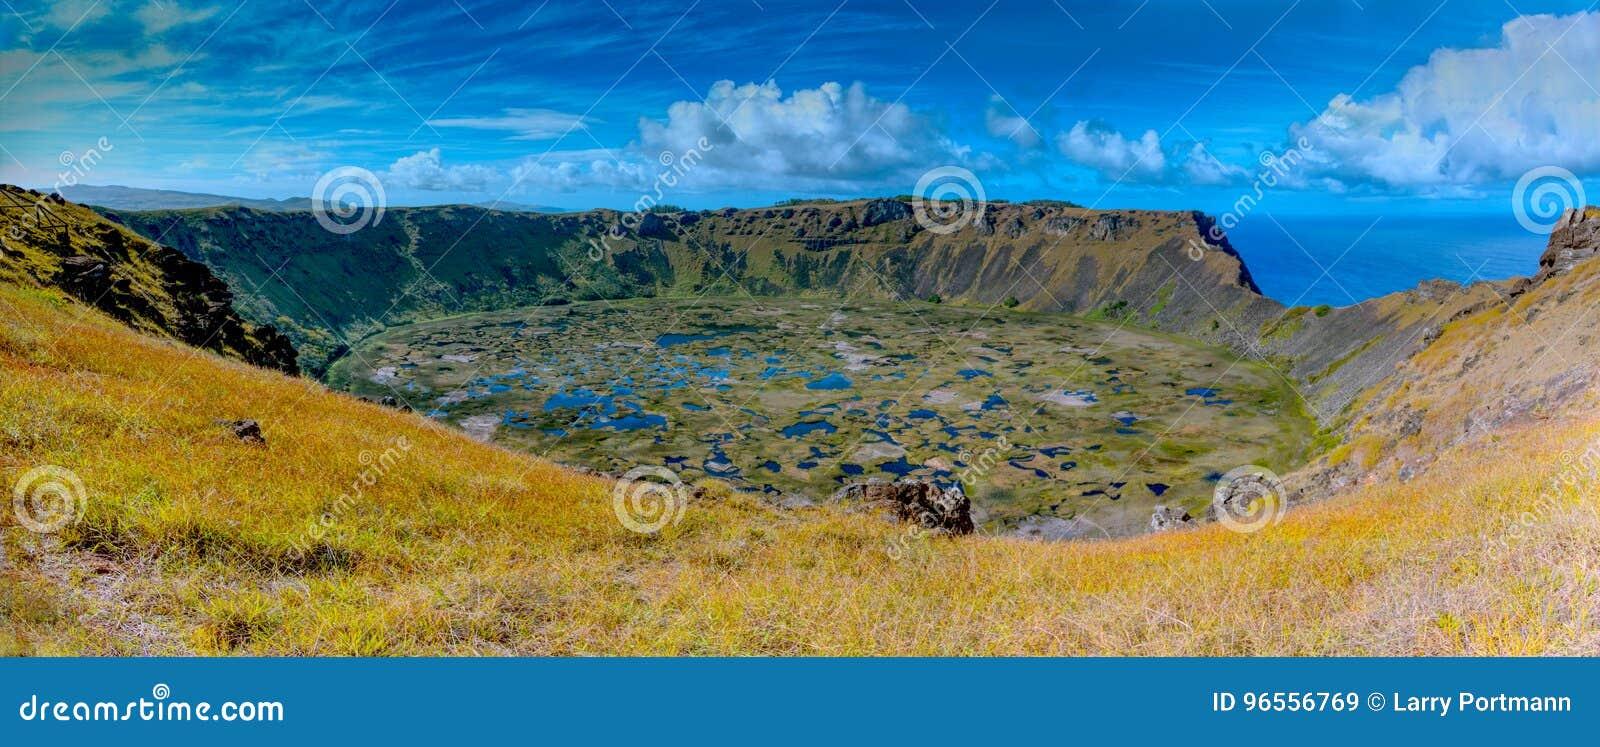 Кратер Kau Ranu на острове пасхи Место всемирного наследия национального парка Rapa Nui